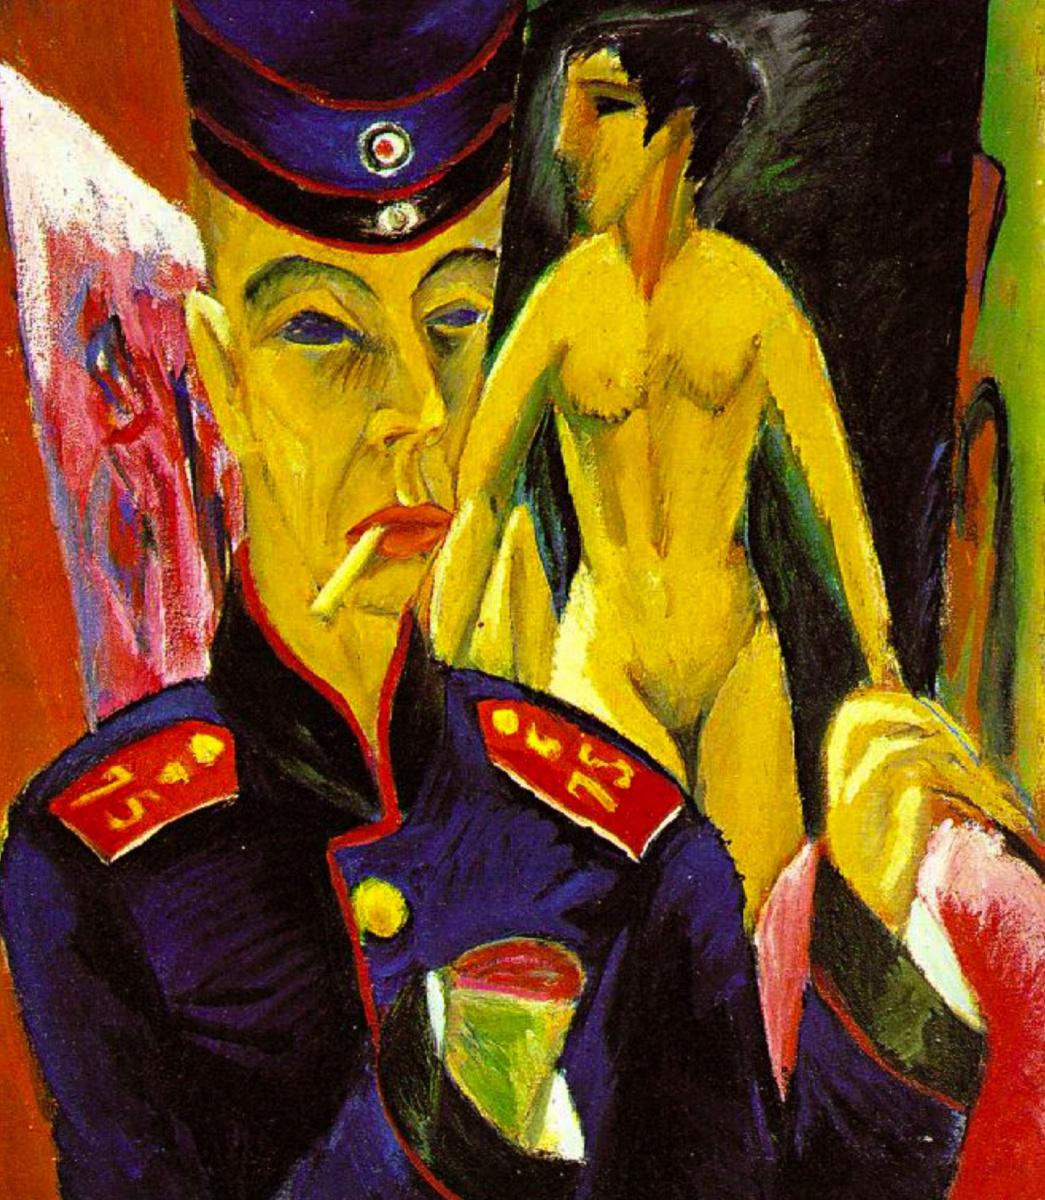 Ernst Ludwig Kirchner. Self-portrait in soldier's uniform